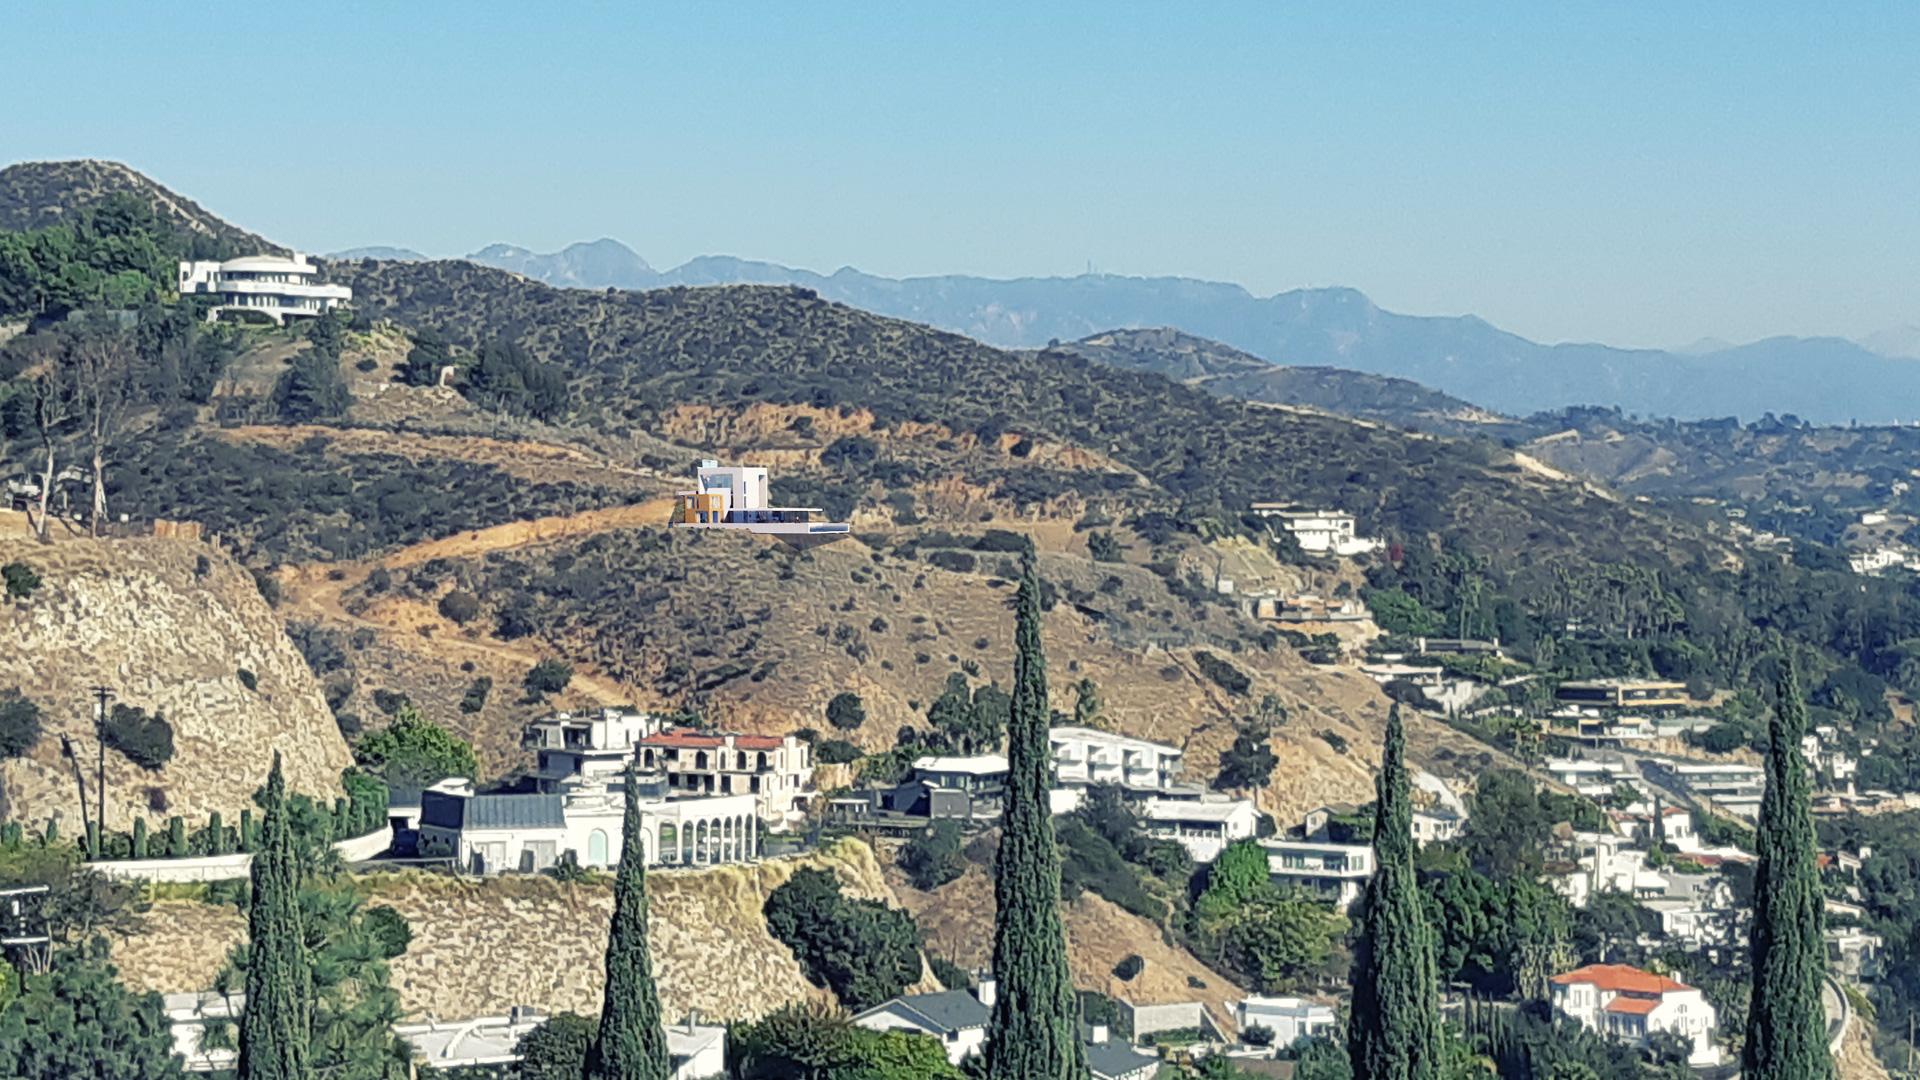 Floral-Ave-Los-Angles-Hollywood-Hills-Fabrizia-Zorzenon.jpg